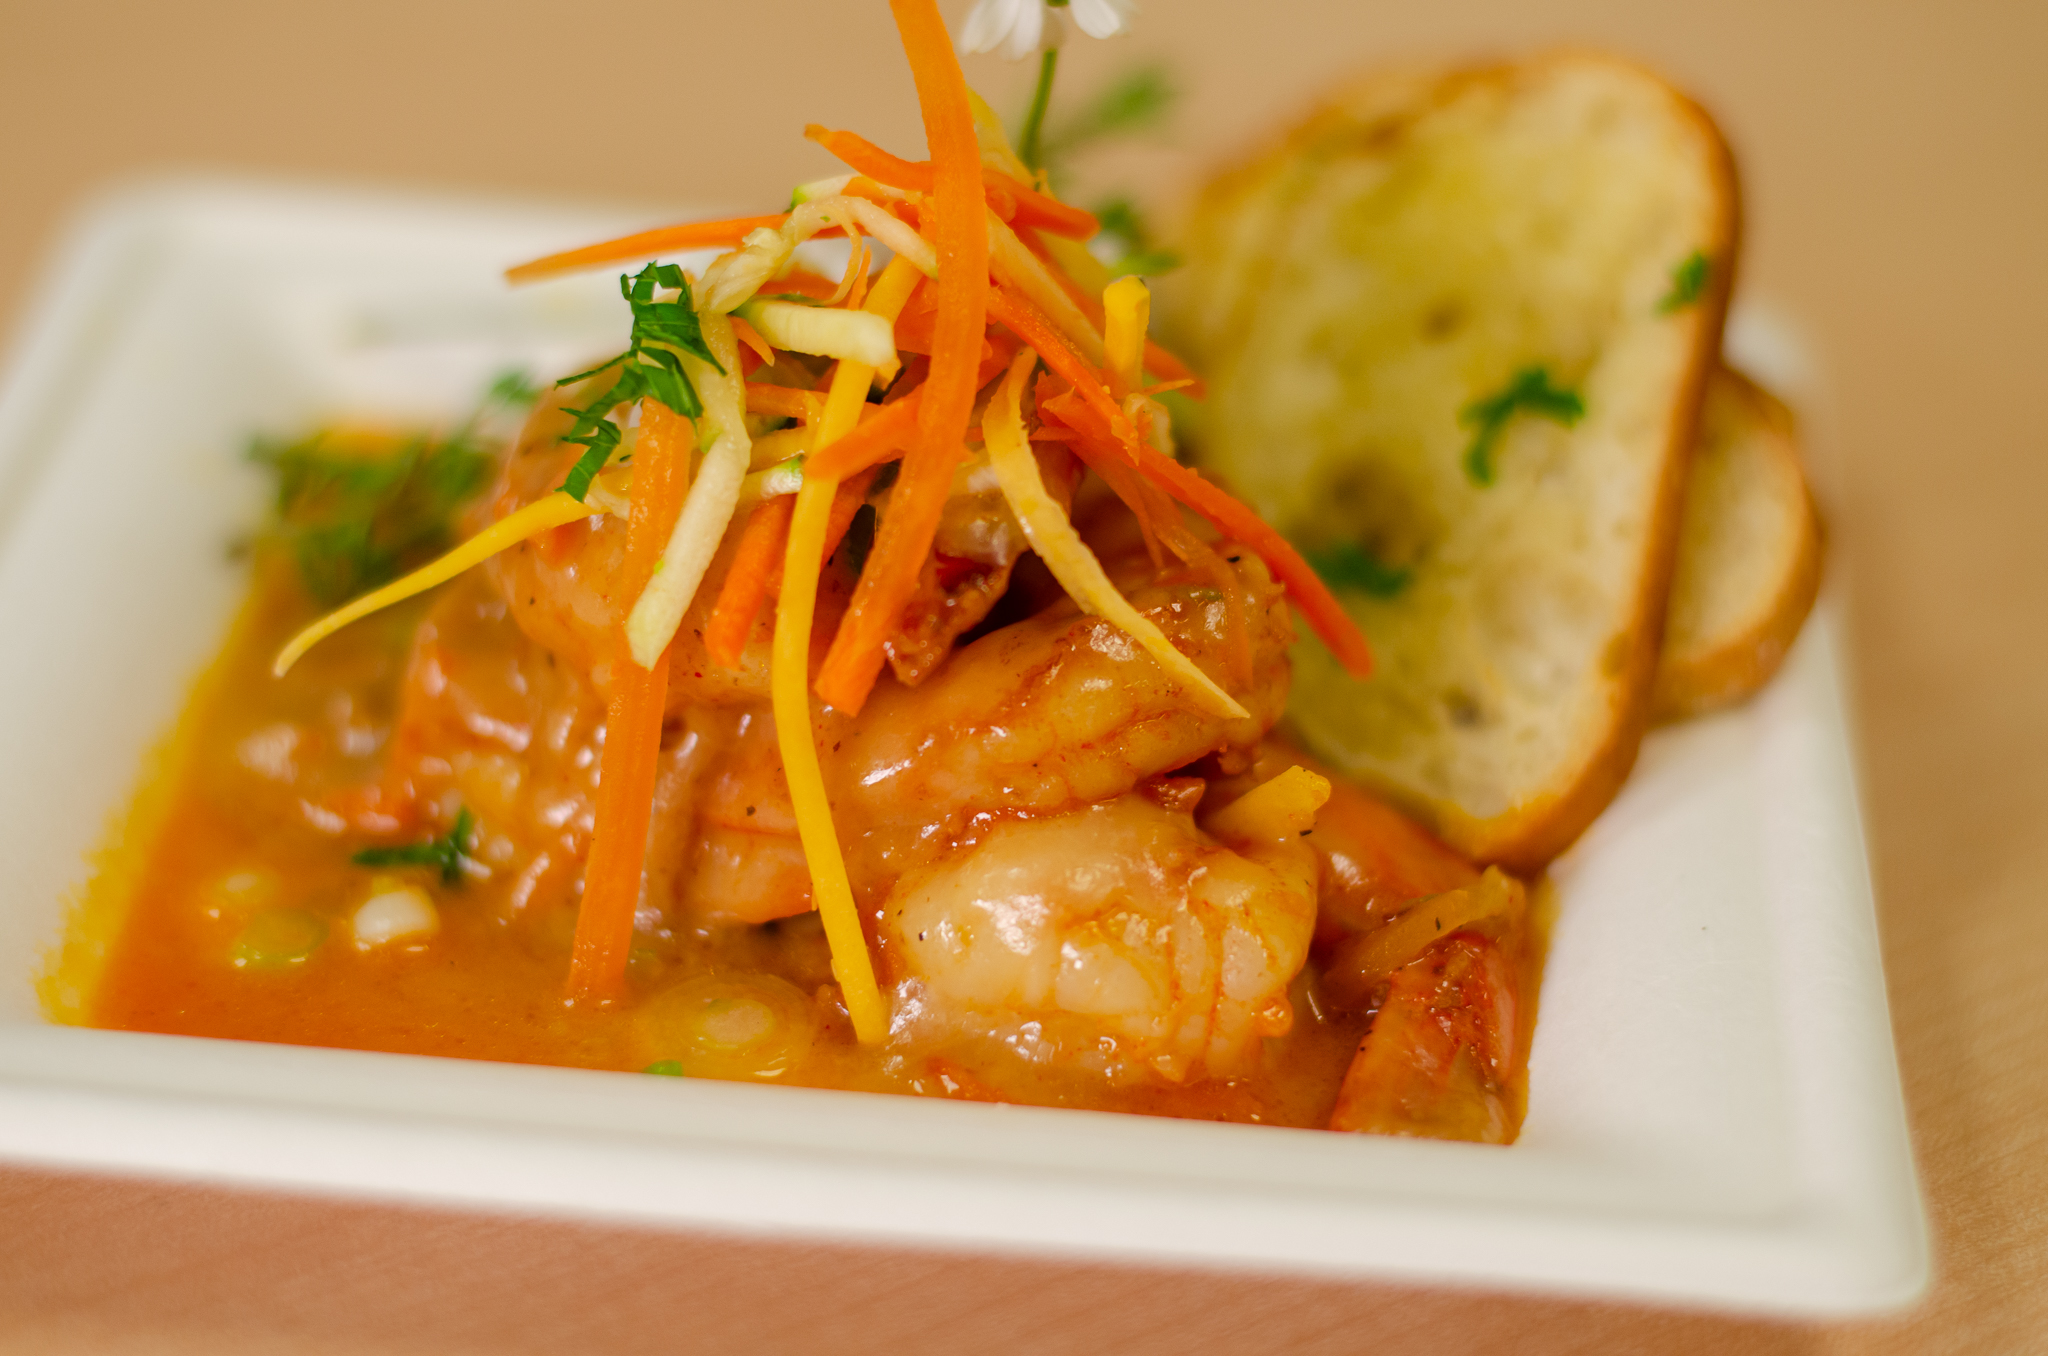 Garlic Cheddar Prawns from Chef Anthony Dalupan in Windsor, Ontario.